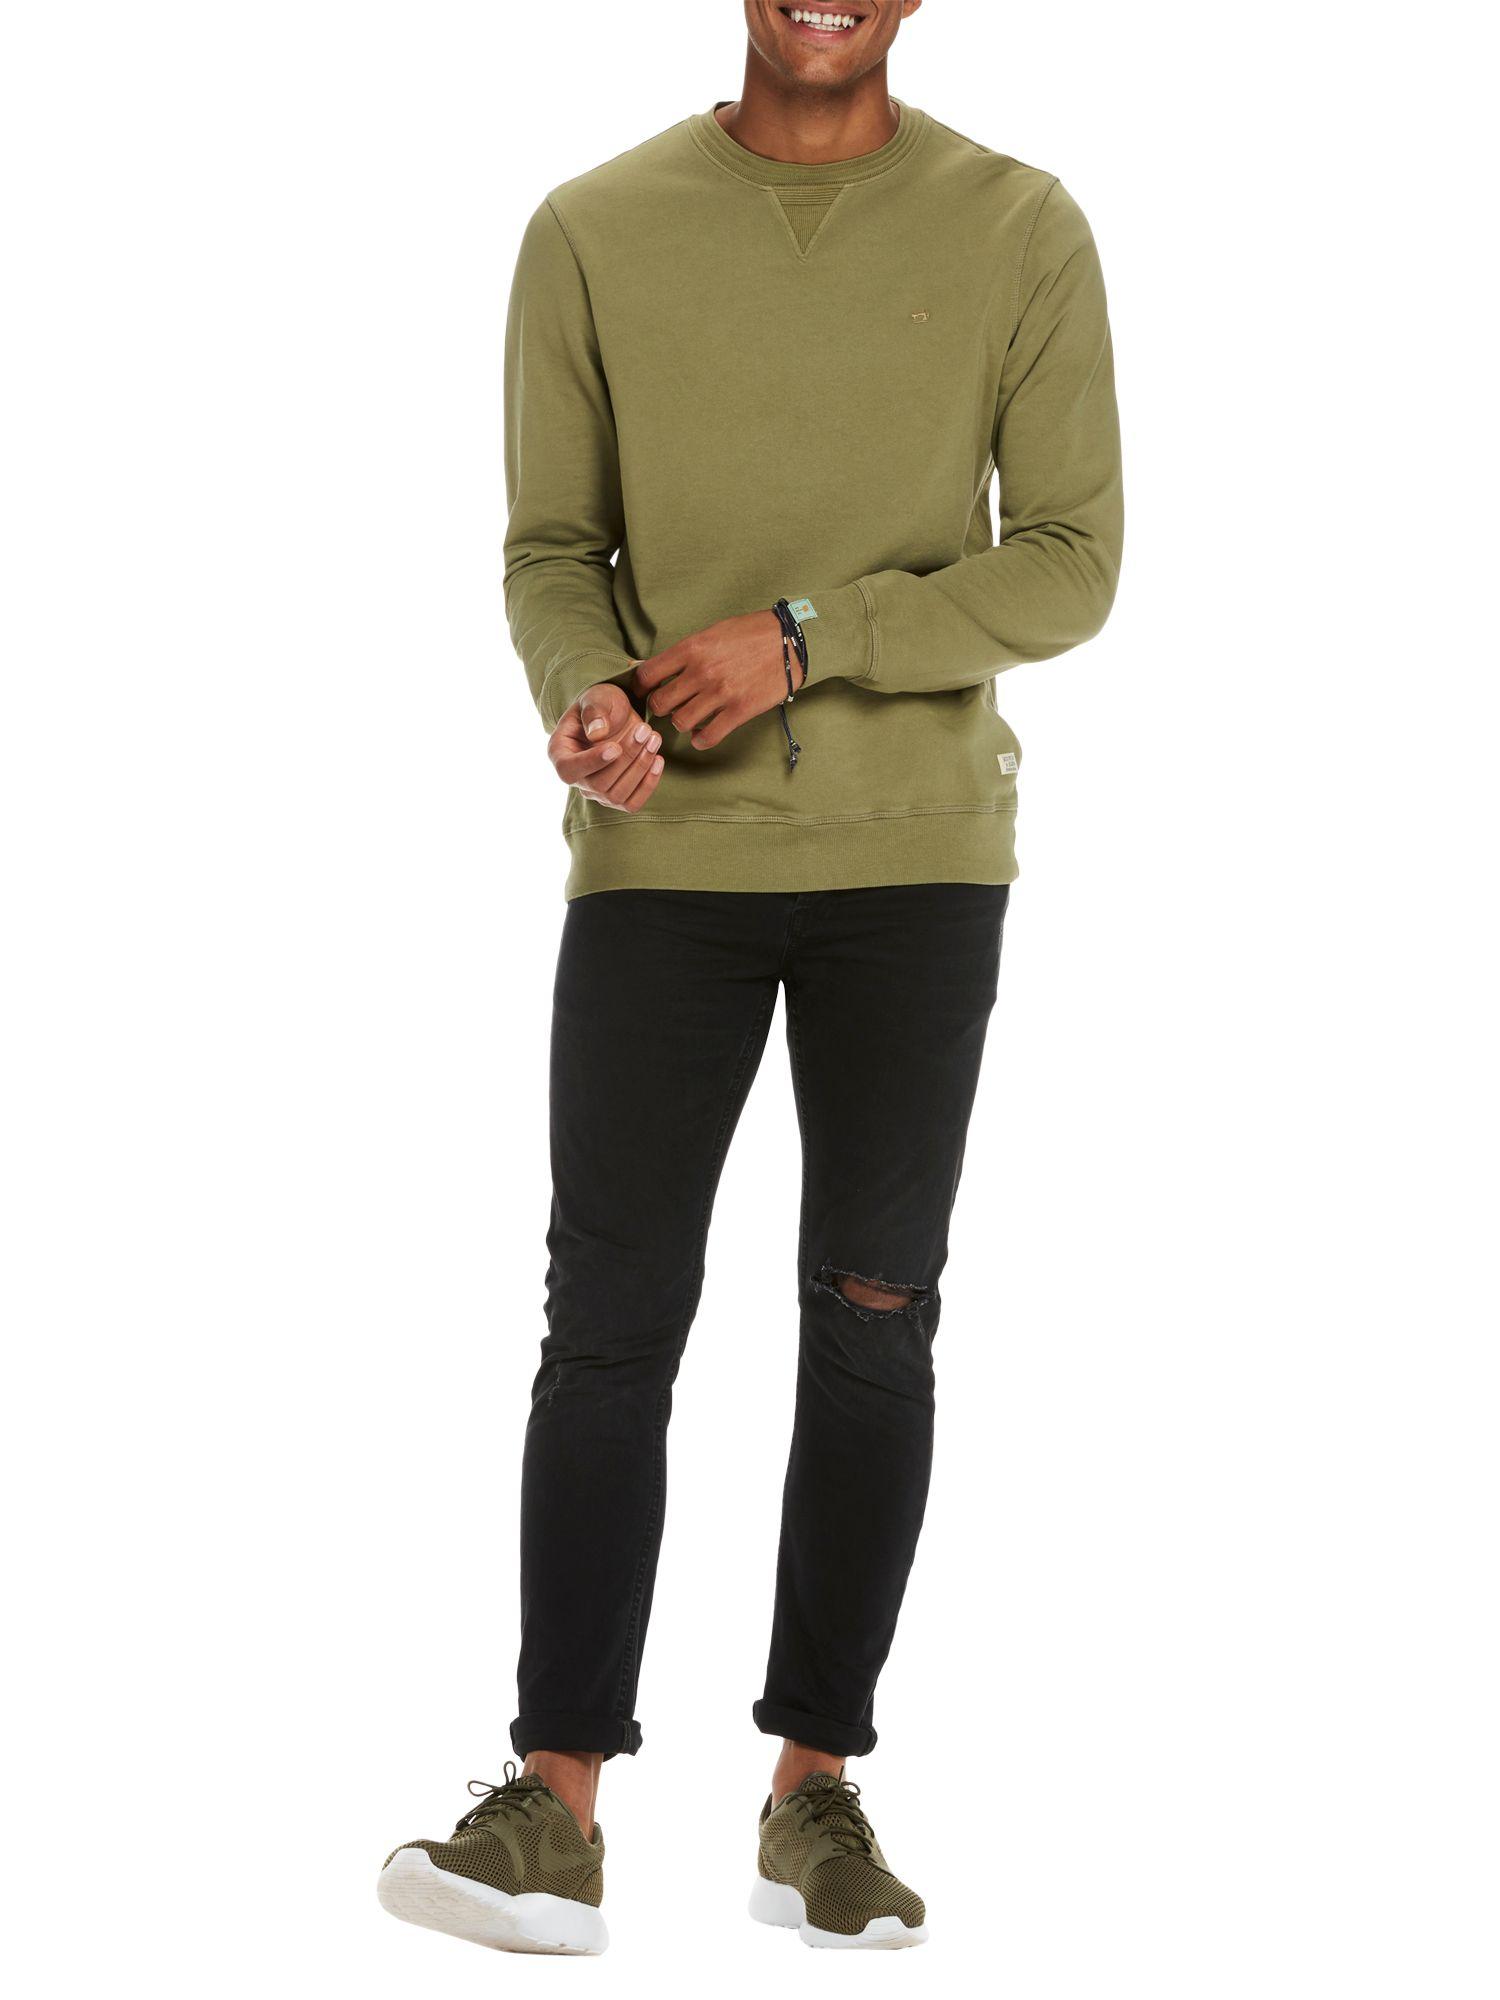 Scotch & Soda Scotch & Soda Garment-Dyed Sweatshirt, Military